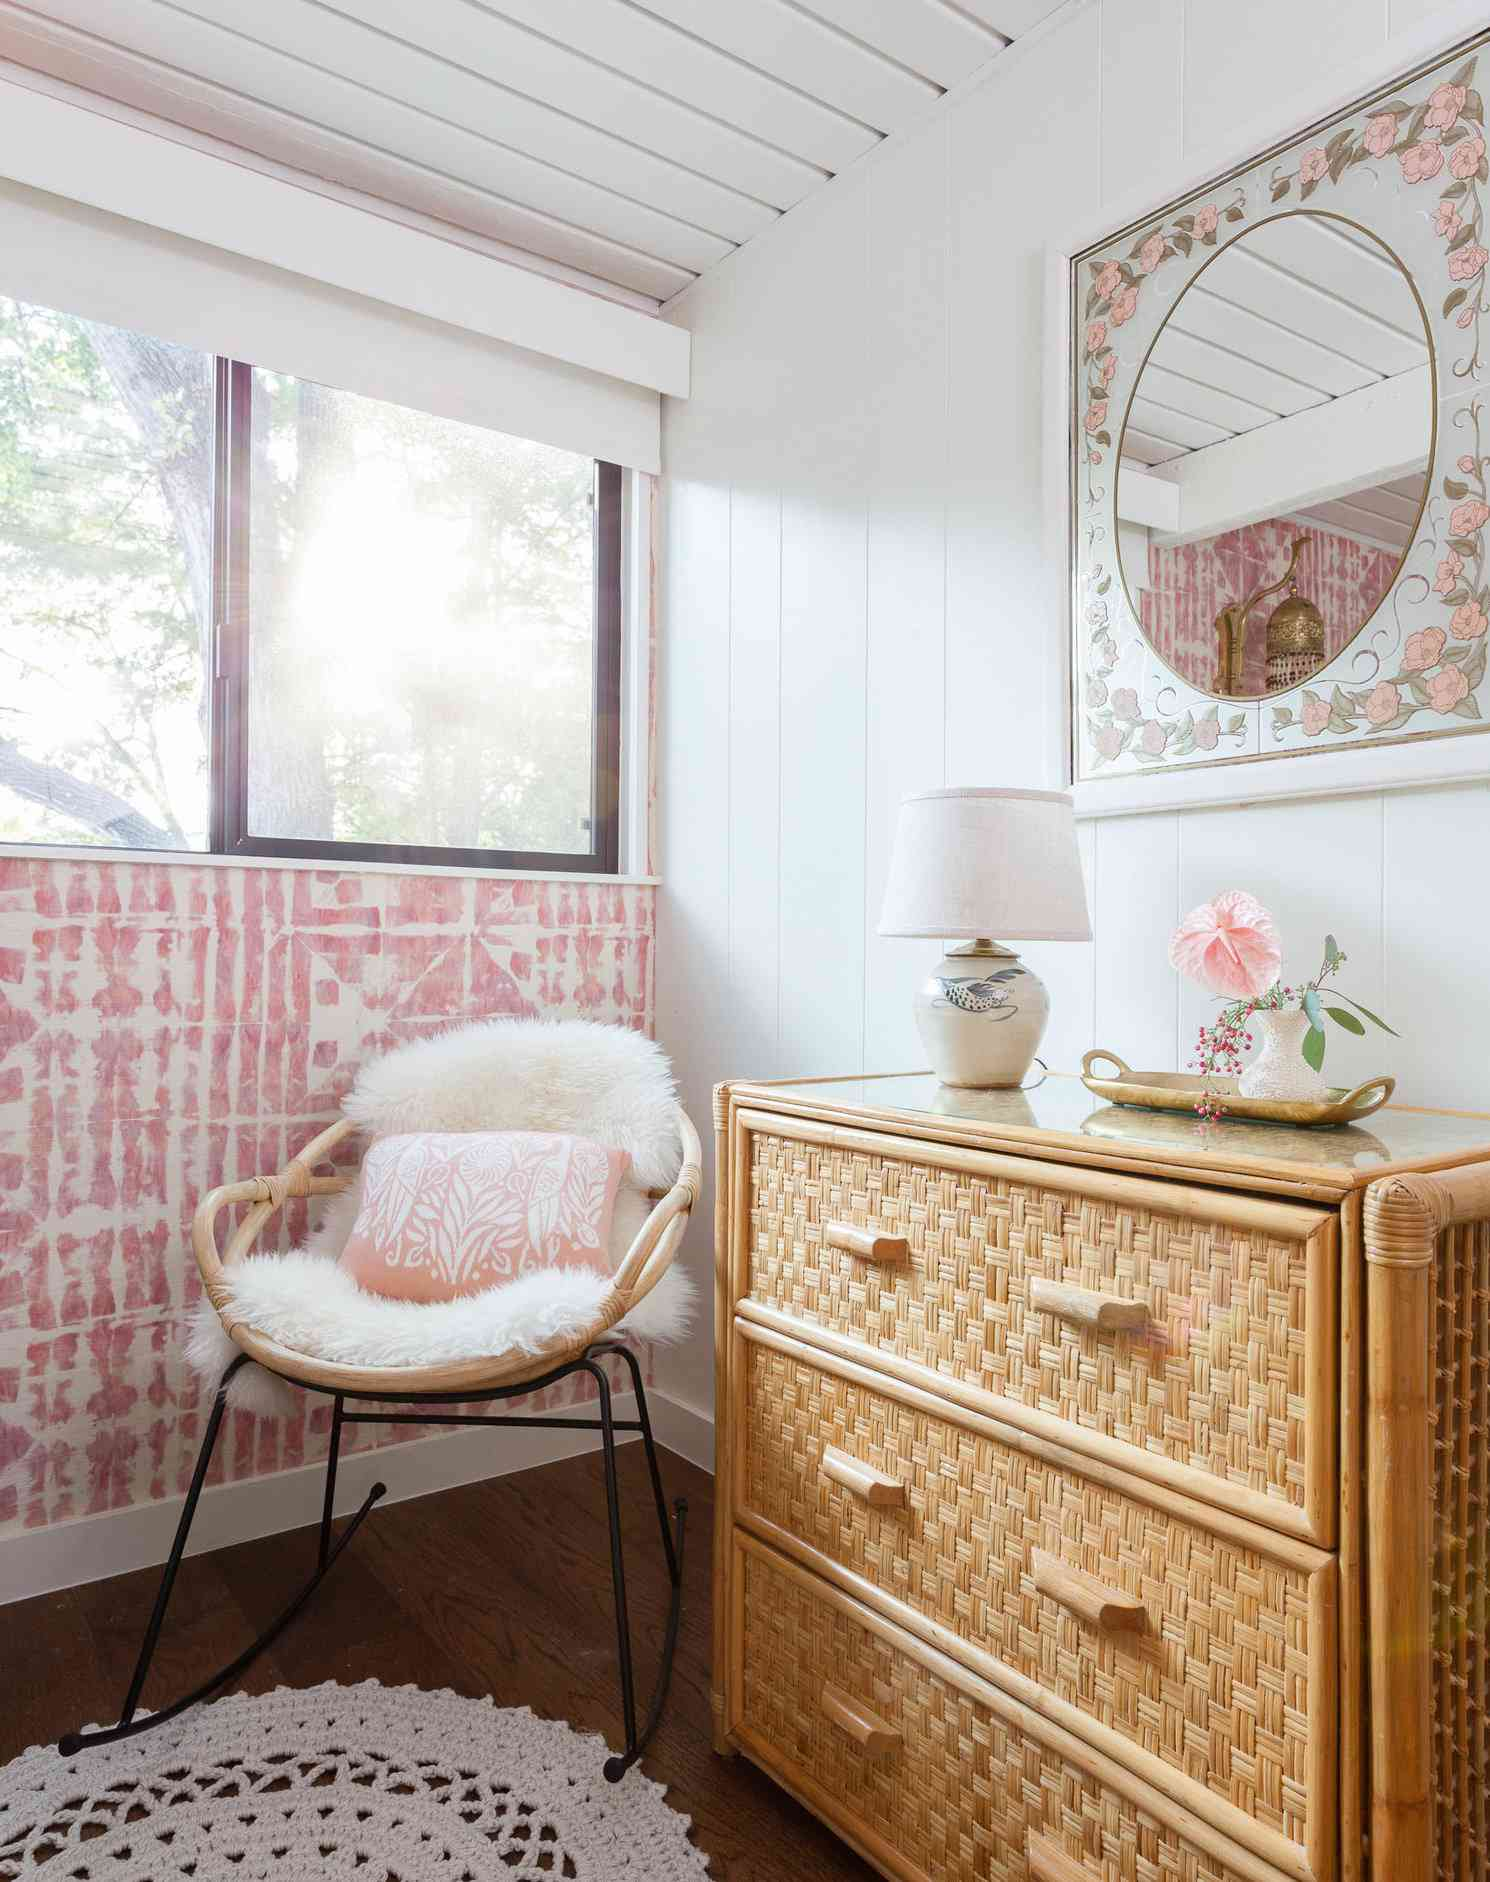 pink bedroom with mirror hanging above dresser